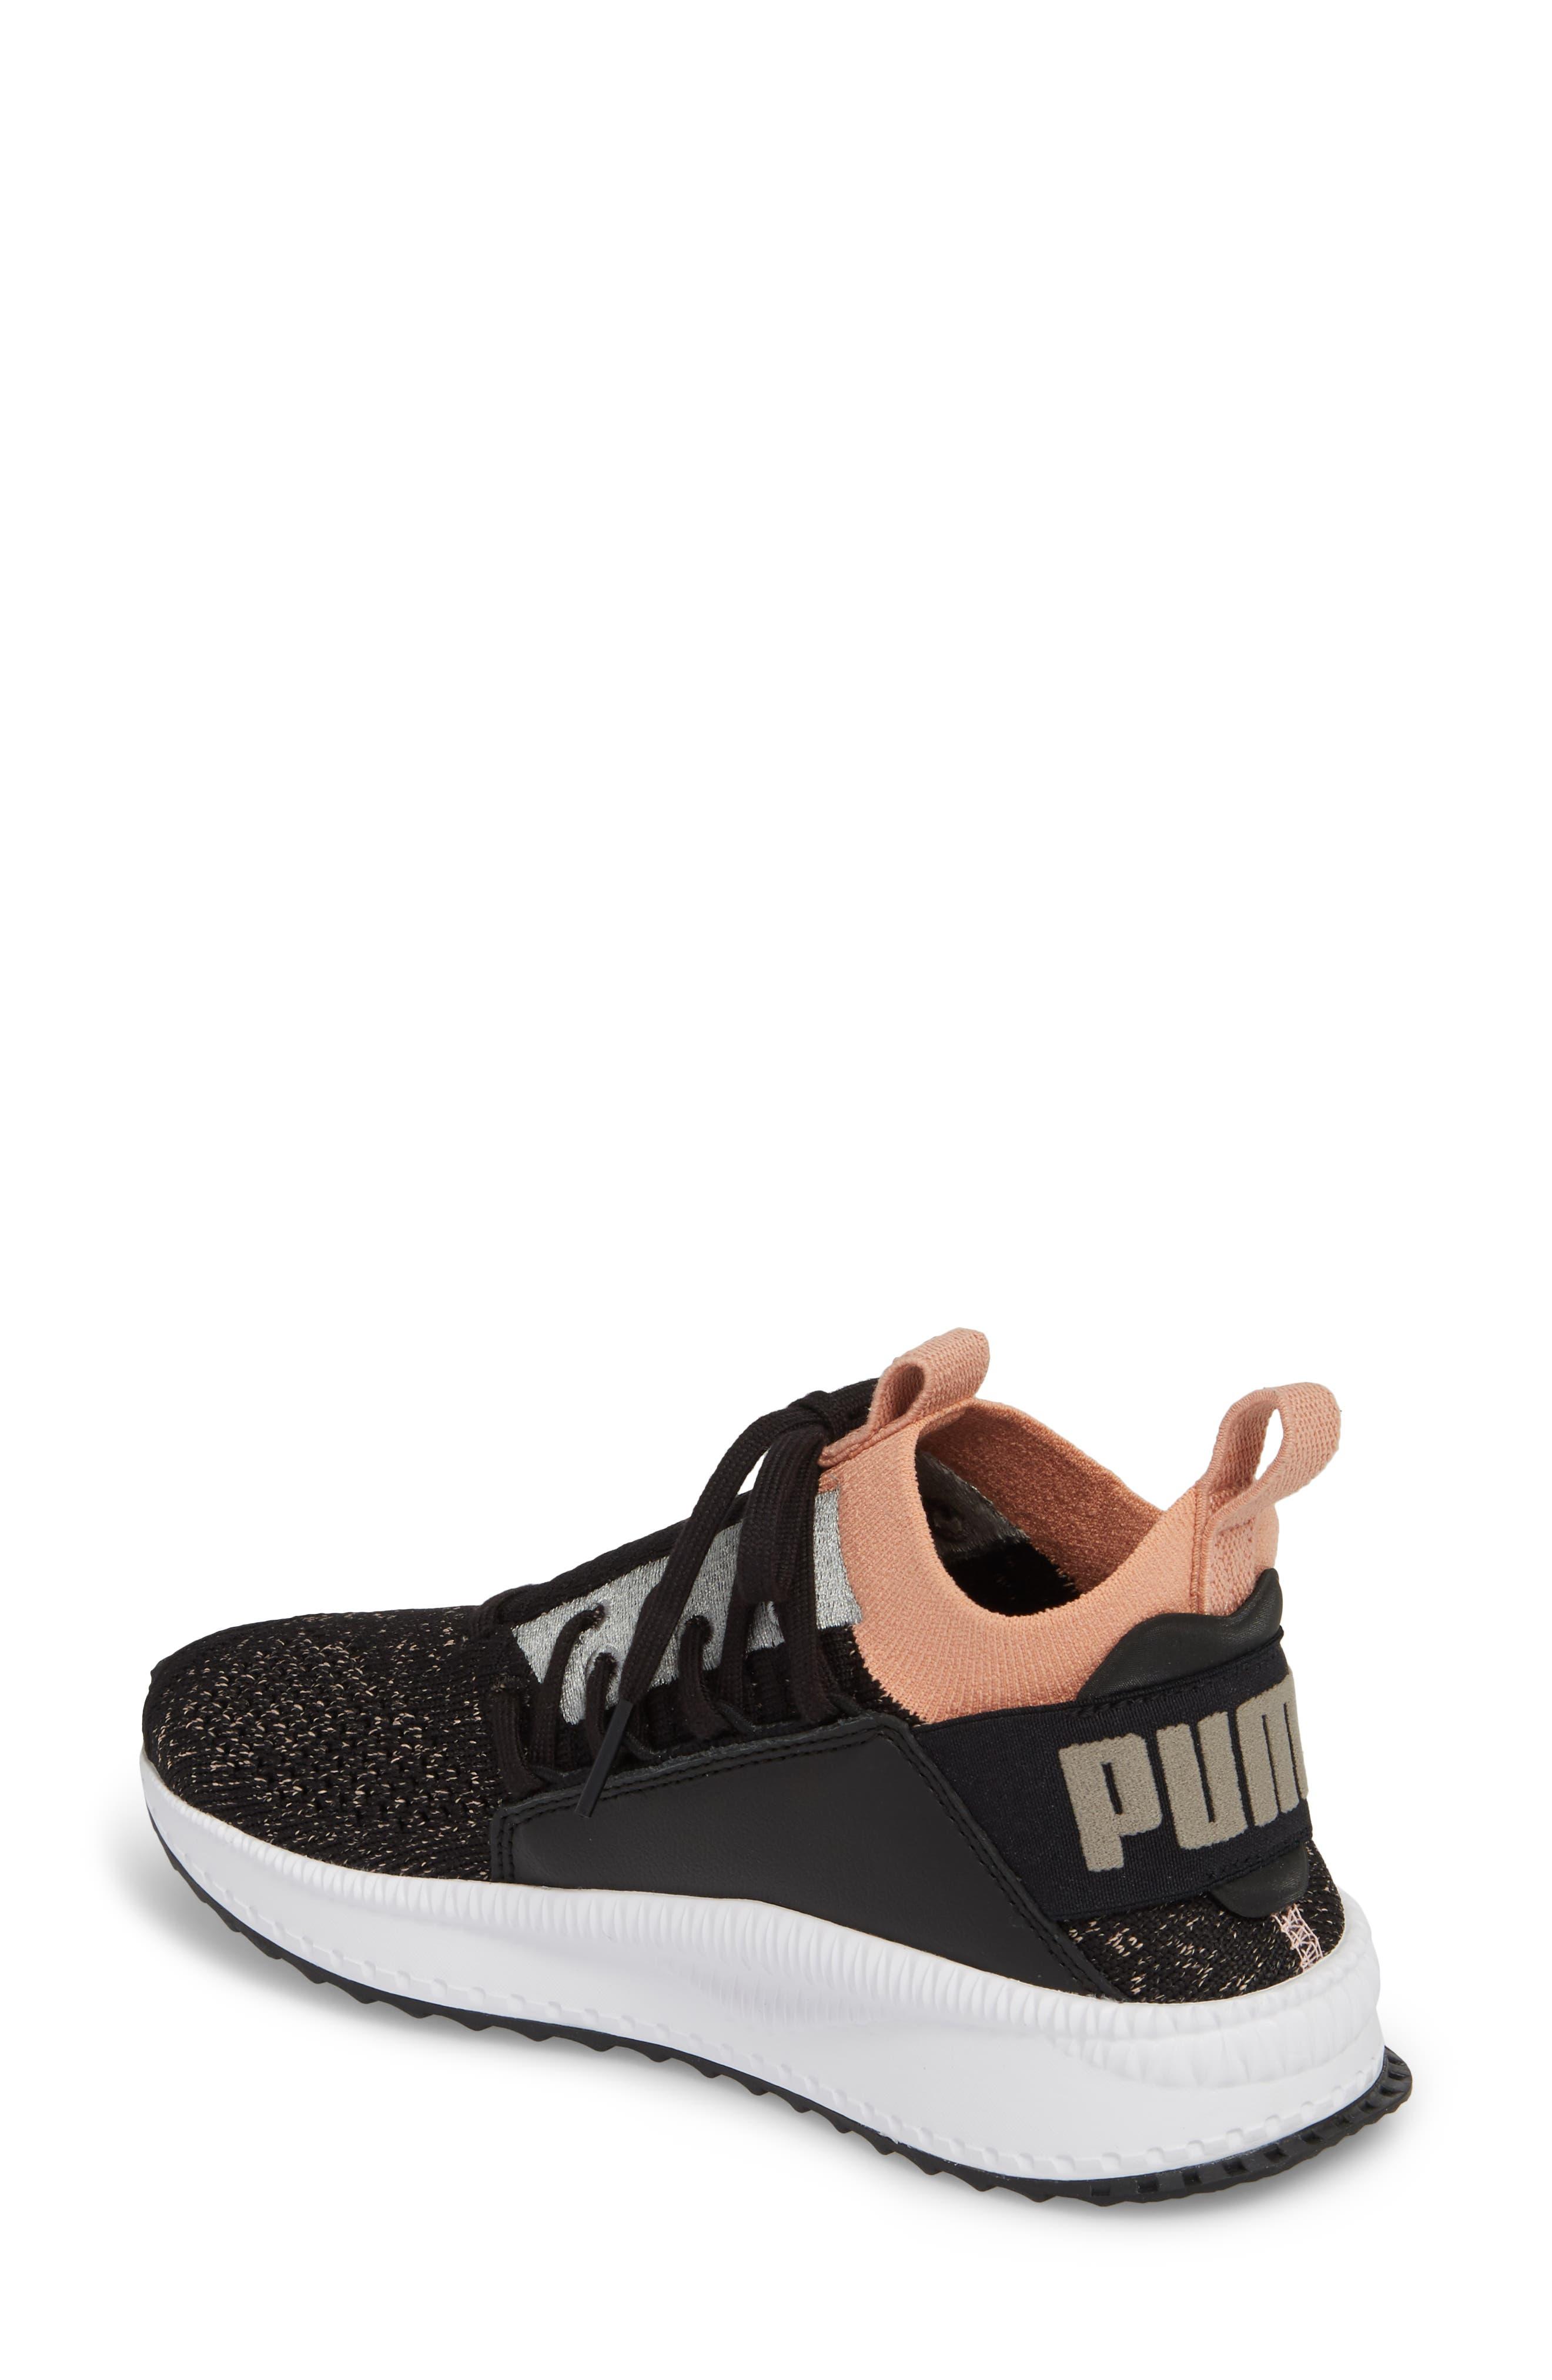 Tsugi Jun Knit Sneaker,                             Alternate thumbnail 2, color,                             001